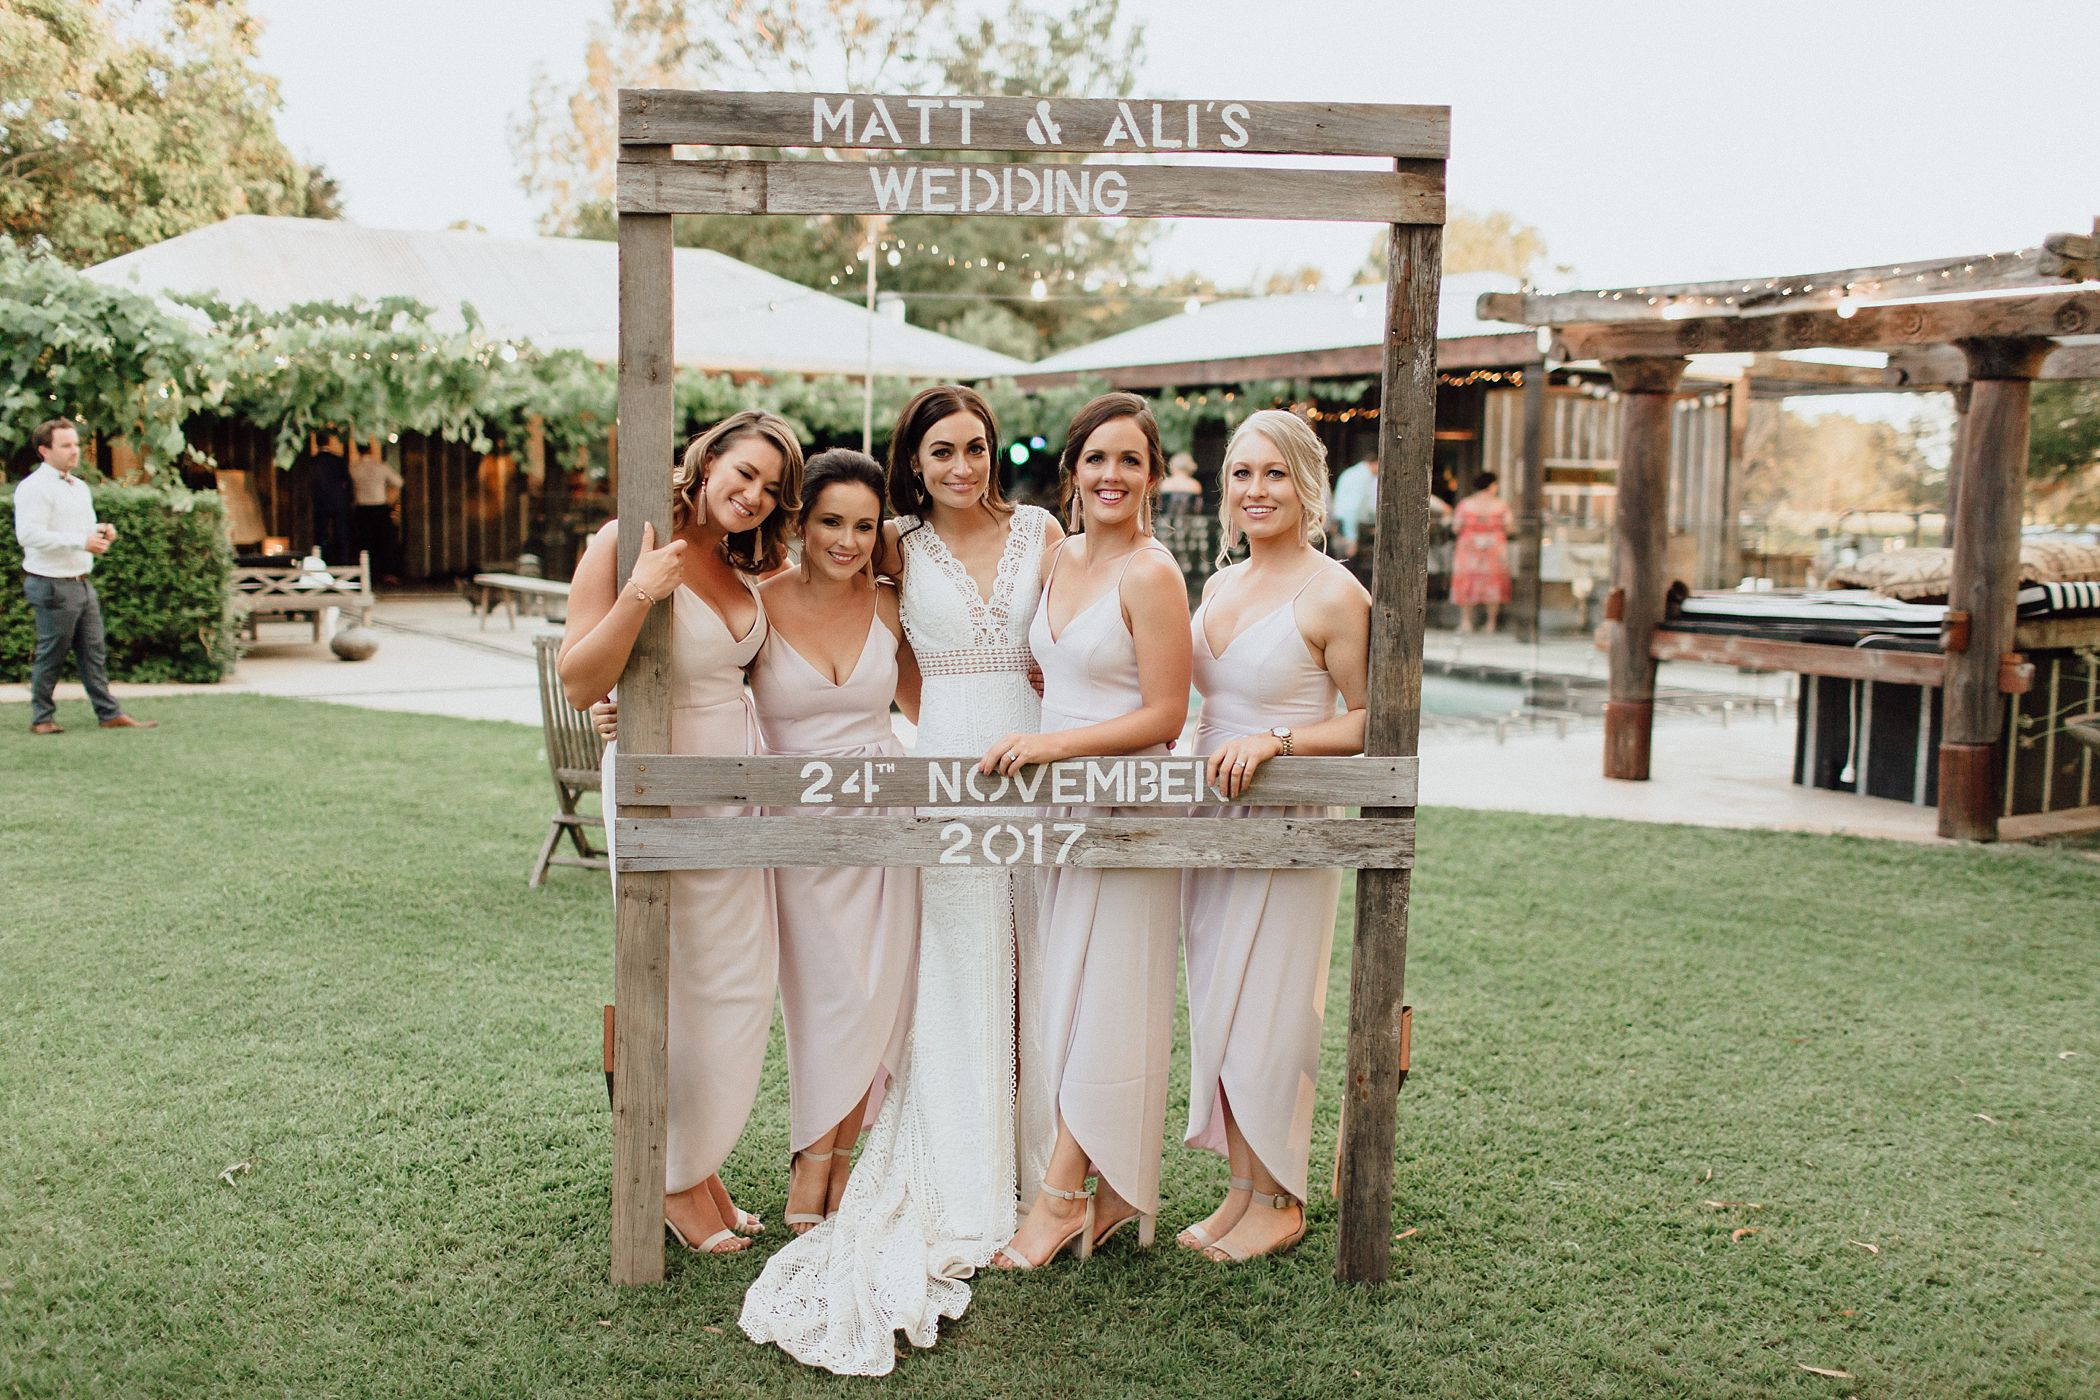 lauren-anne-photography-newcastle-wedding-photographer-mindaribba-house_0126.jpg